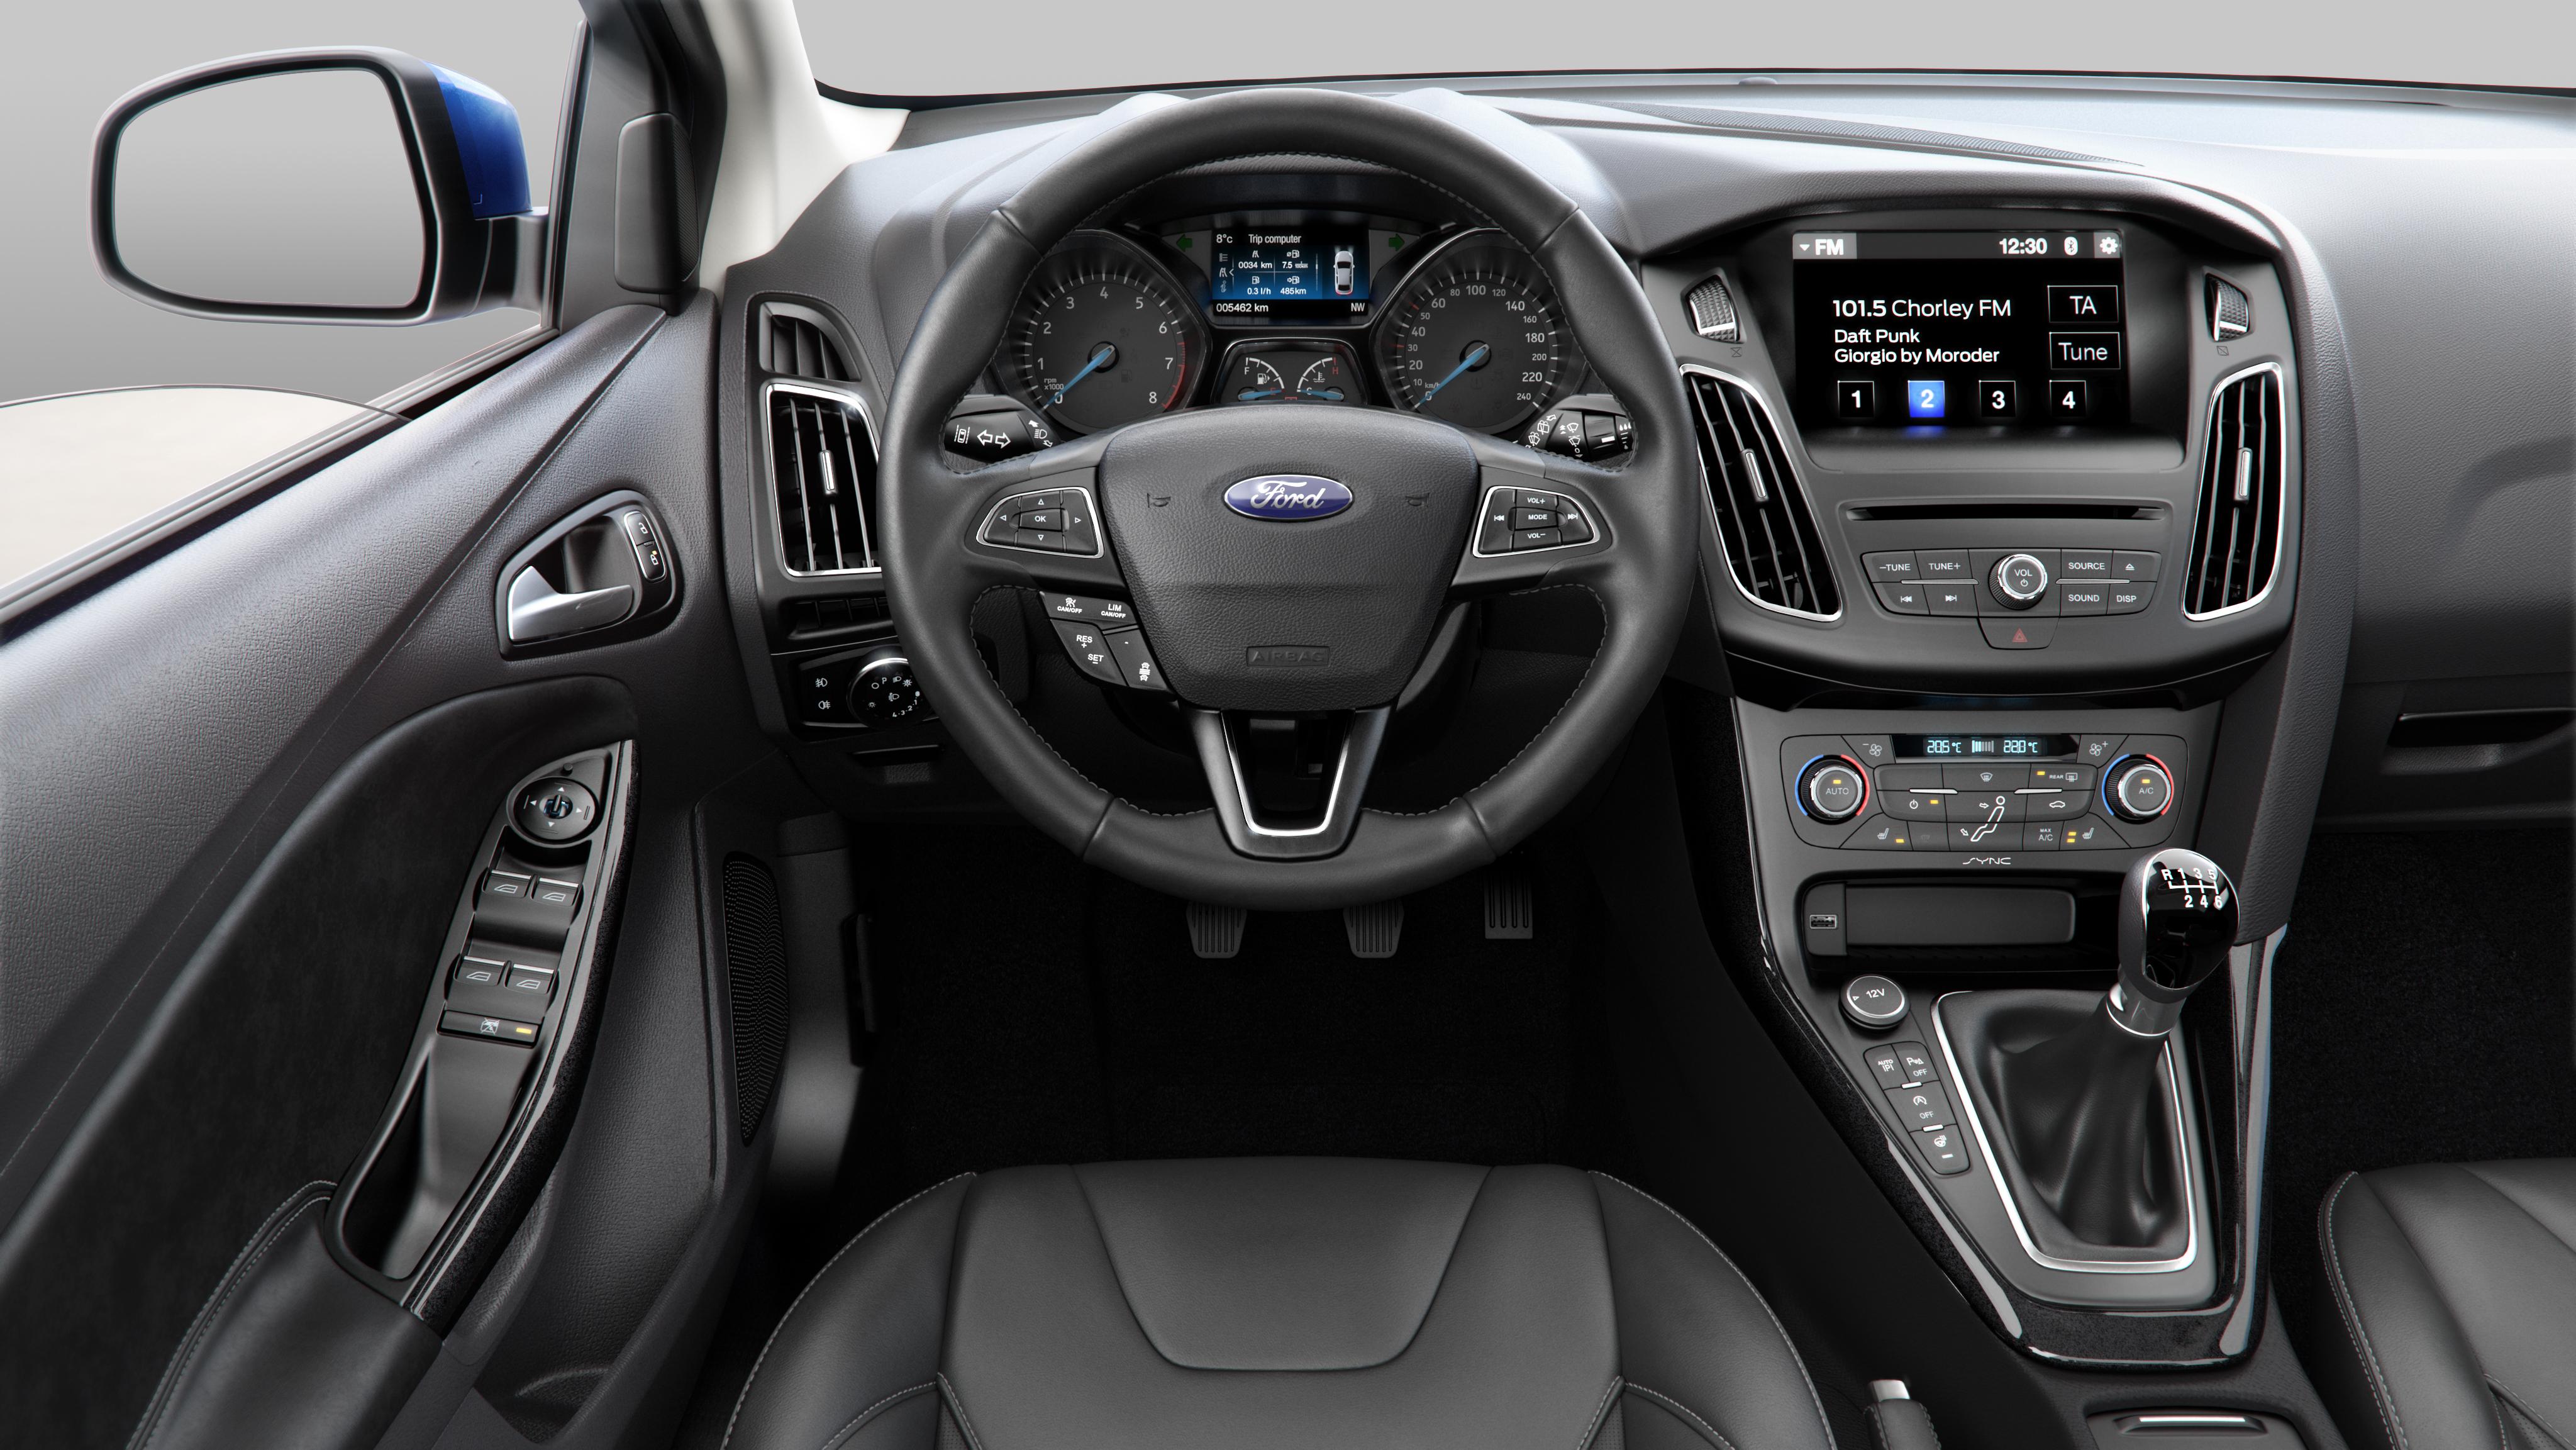 Superb Ford Focus 2015 Interior Visulisation Ashton Woolley